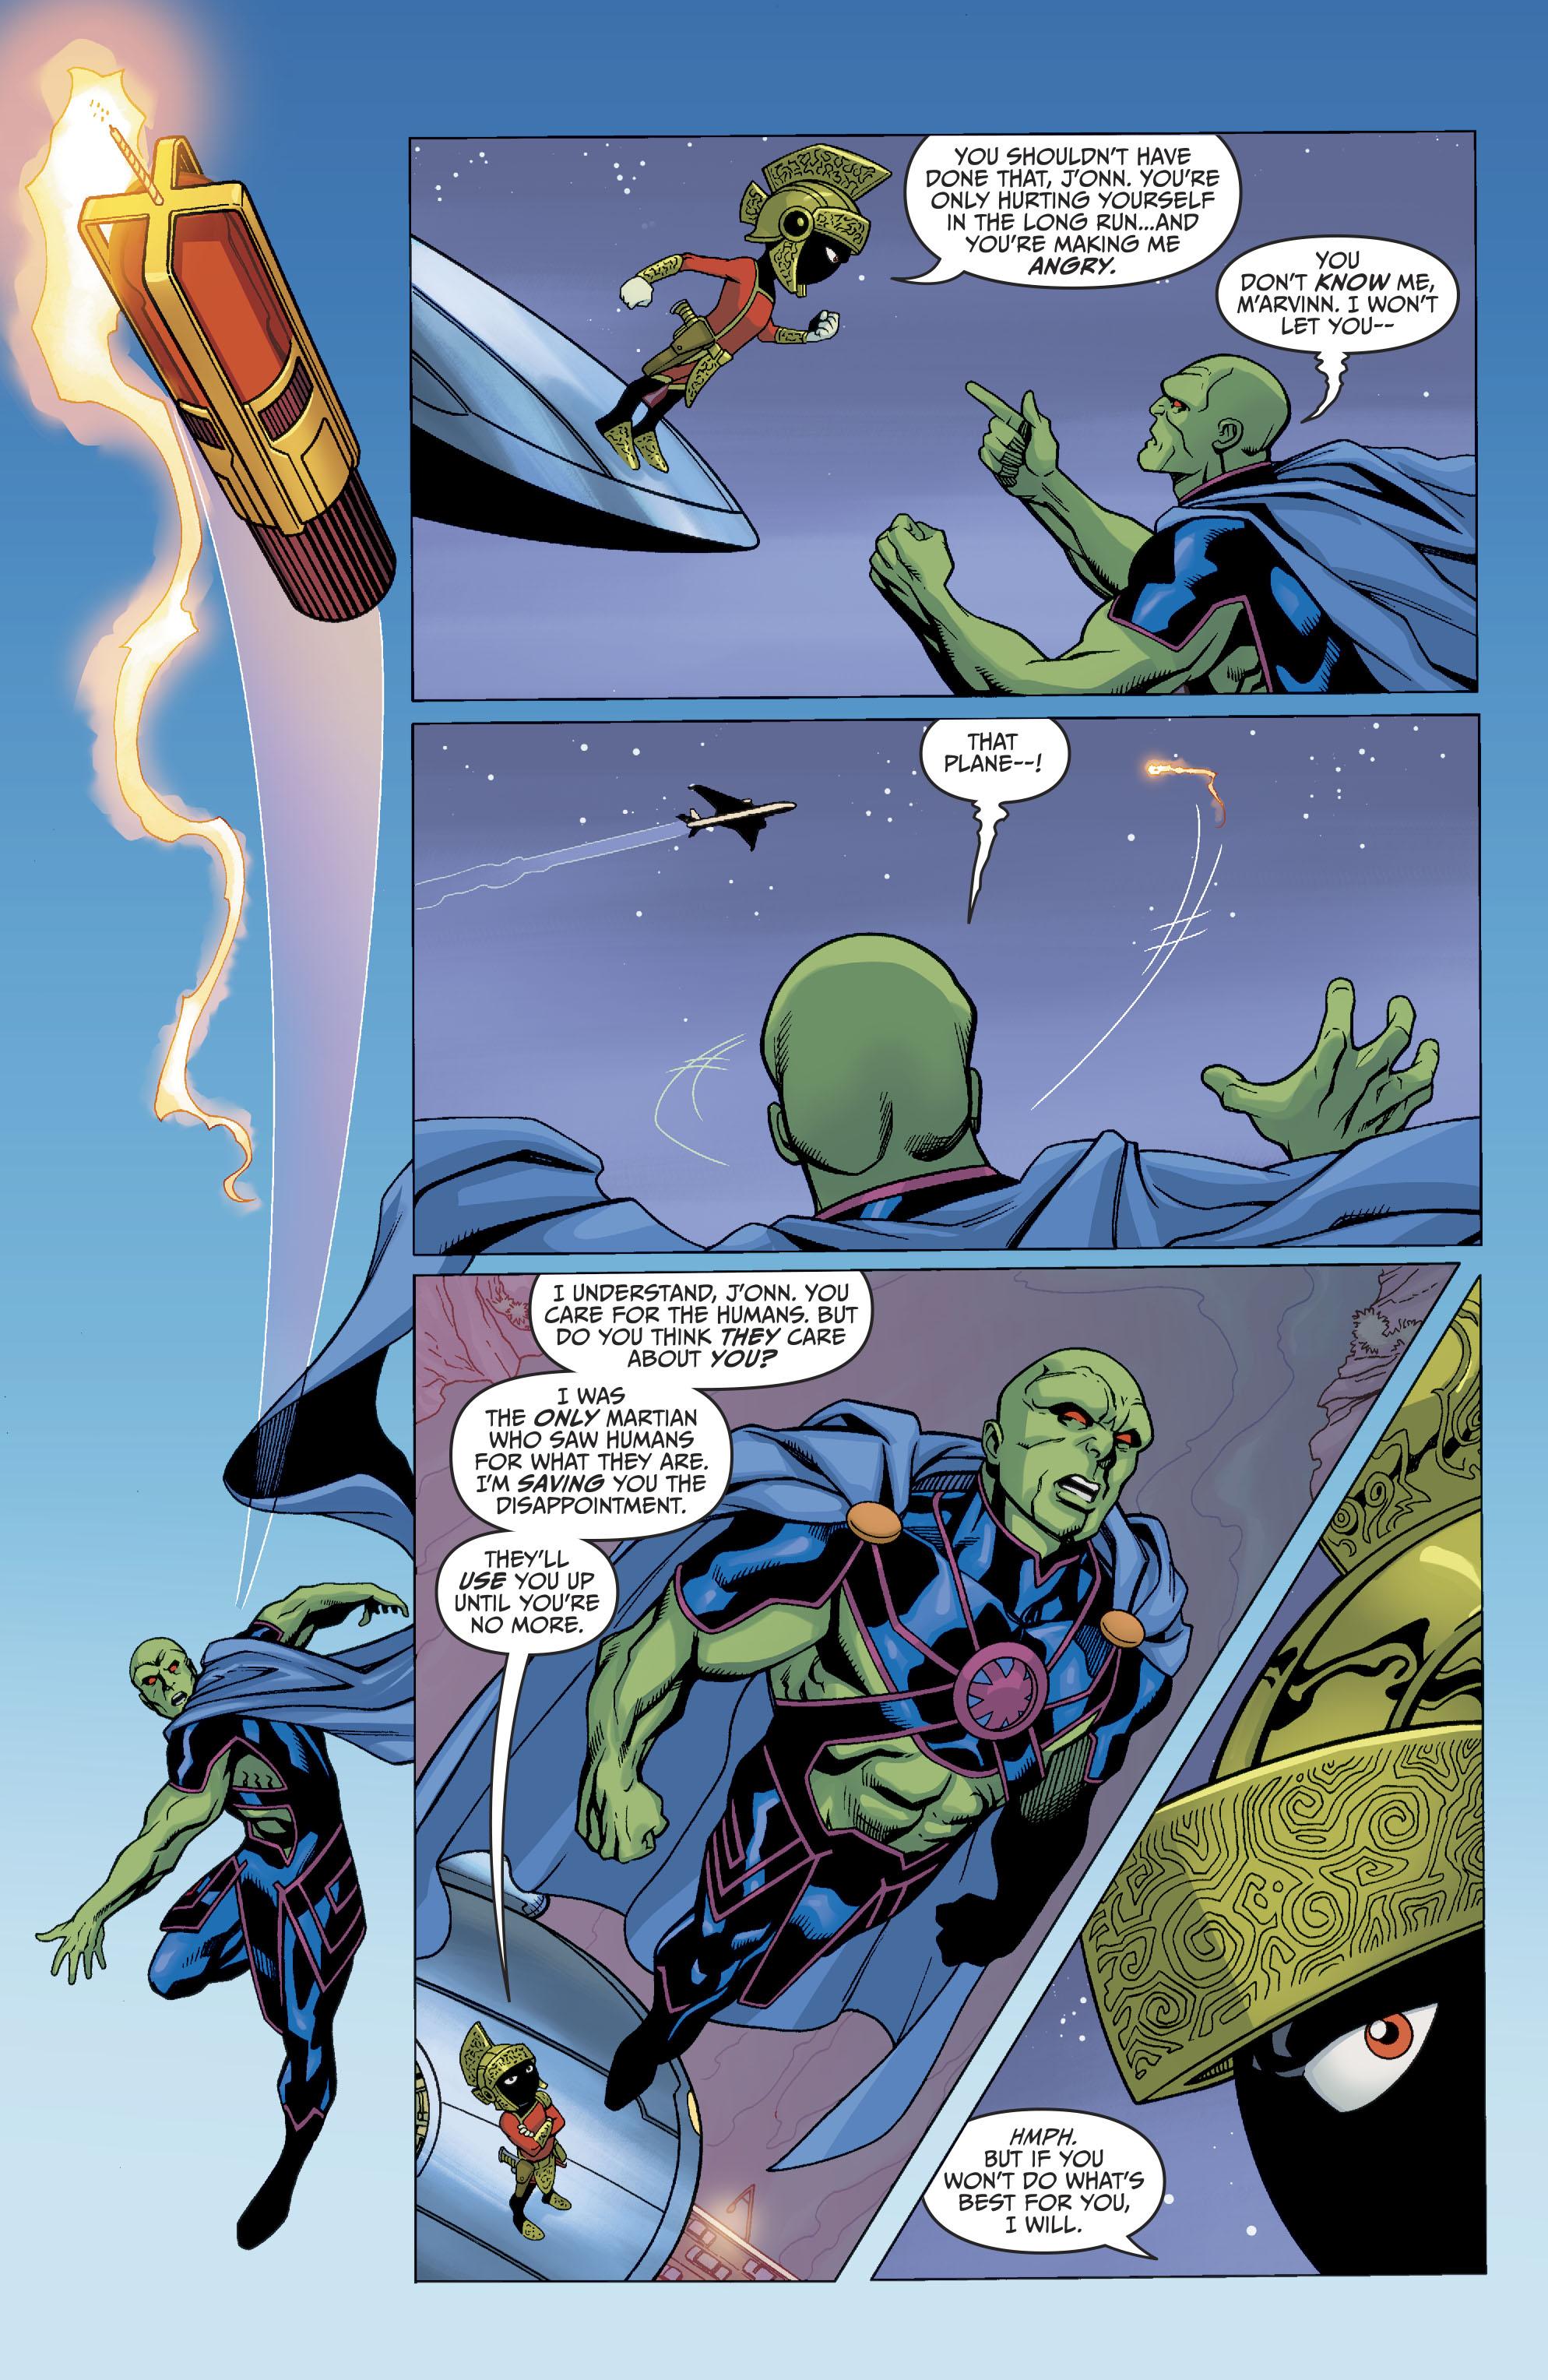 Read online Martian Manhunter/Marvin the Martian Special comic -  Issue # Full - 14